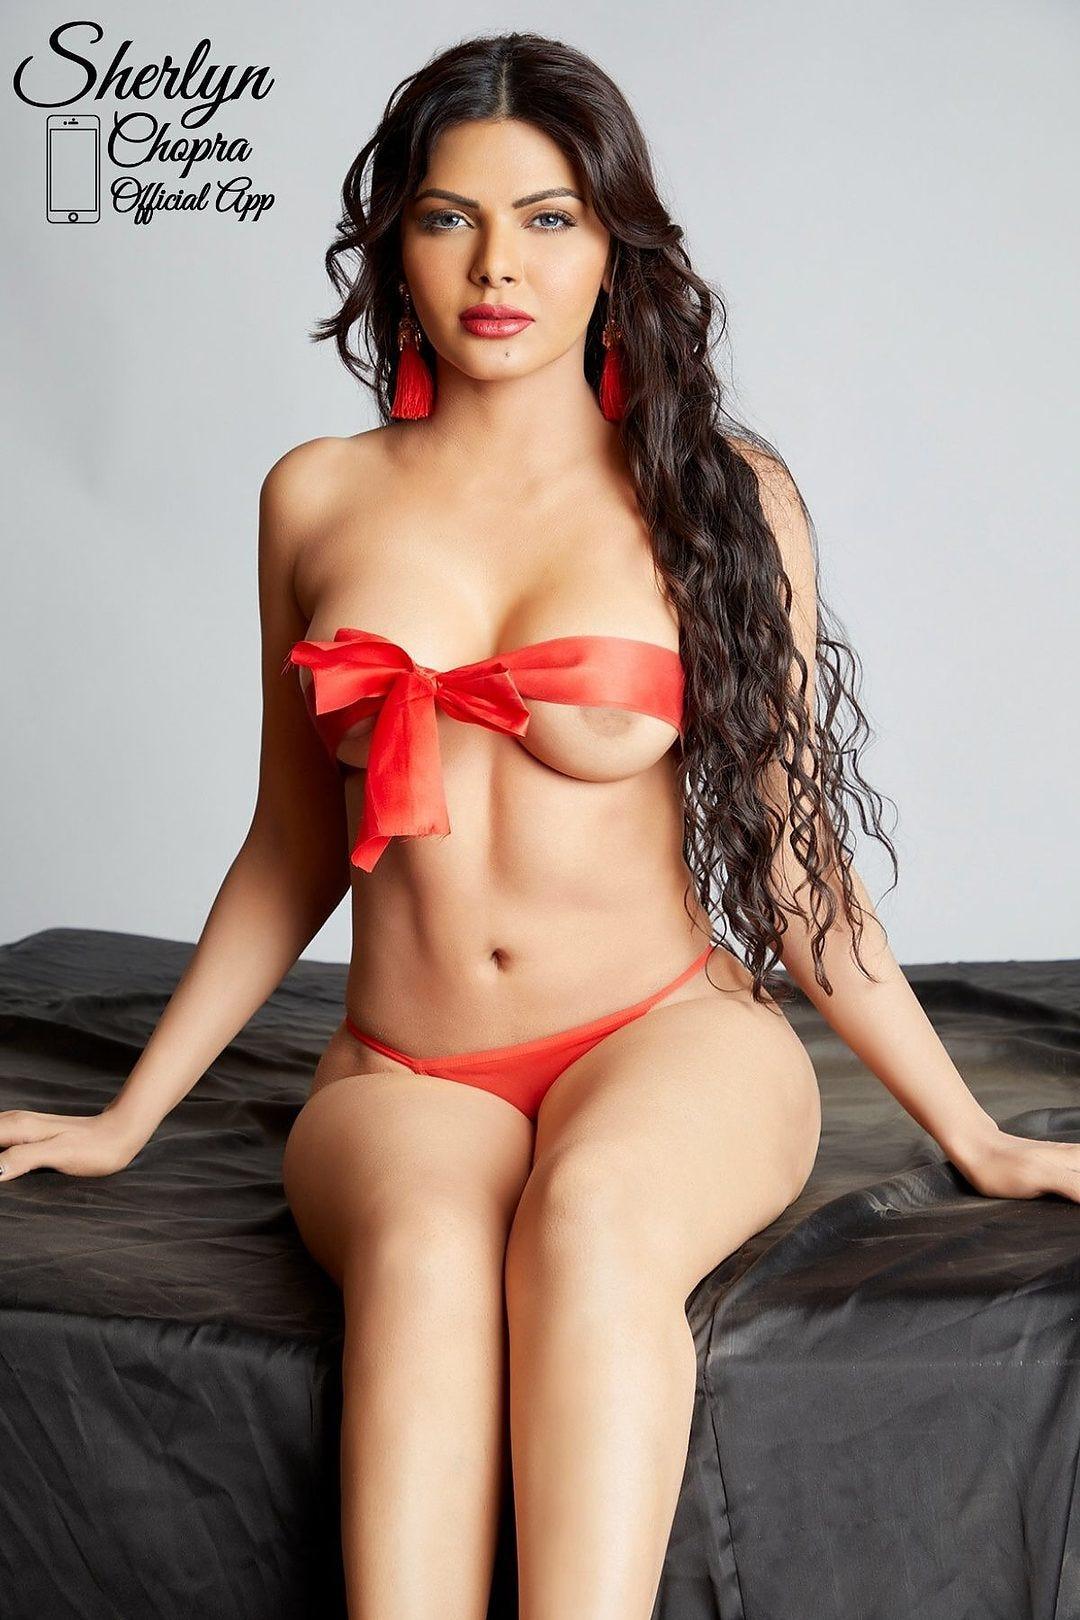 Sherlyn chopra indian actress